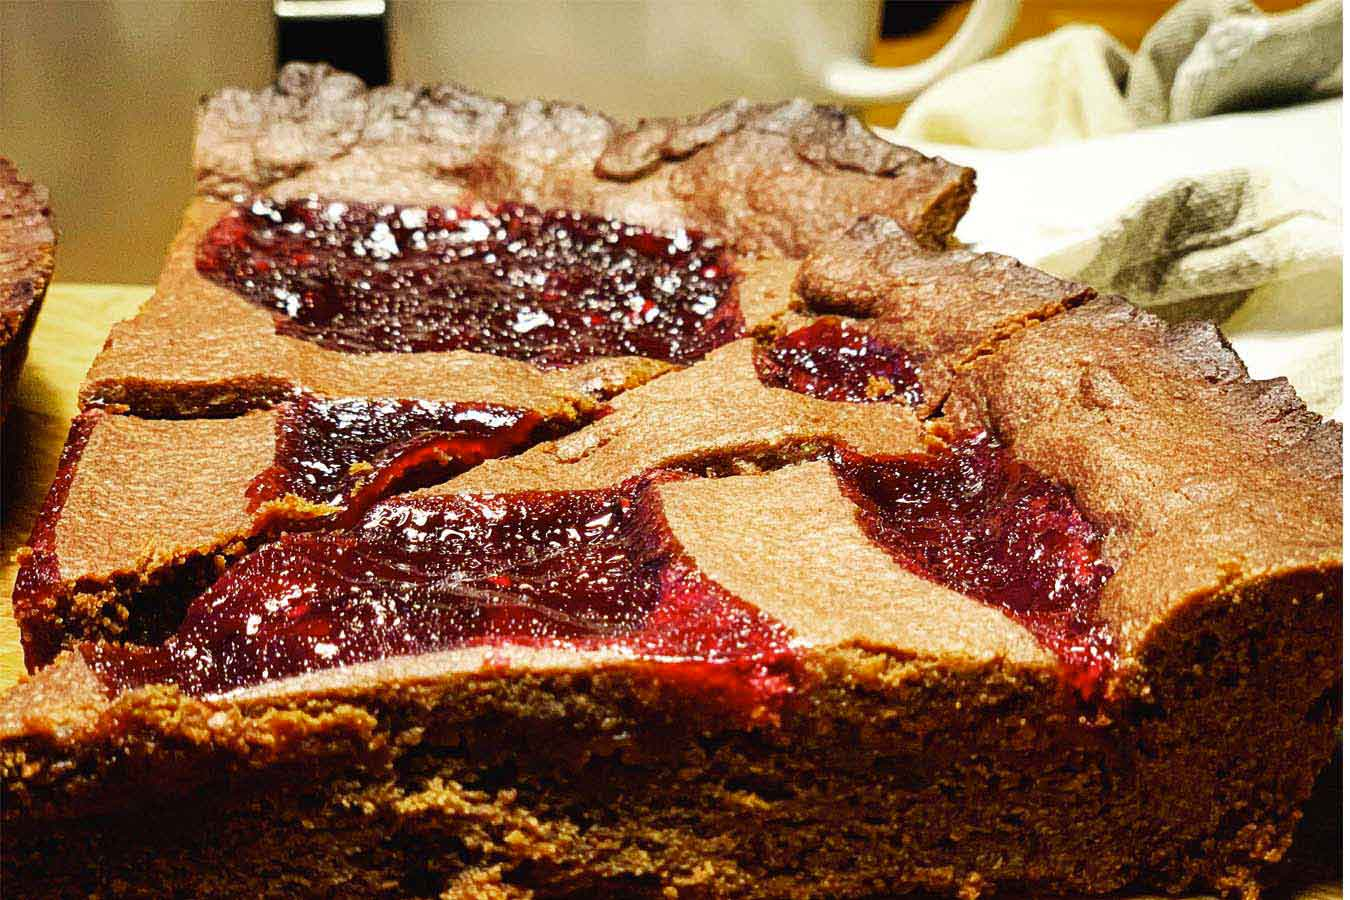 Dolci semplici con la Pasta Frolla: la nostra Top 5